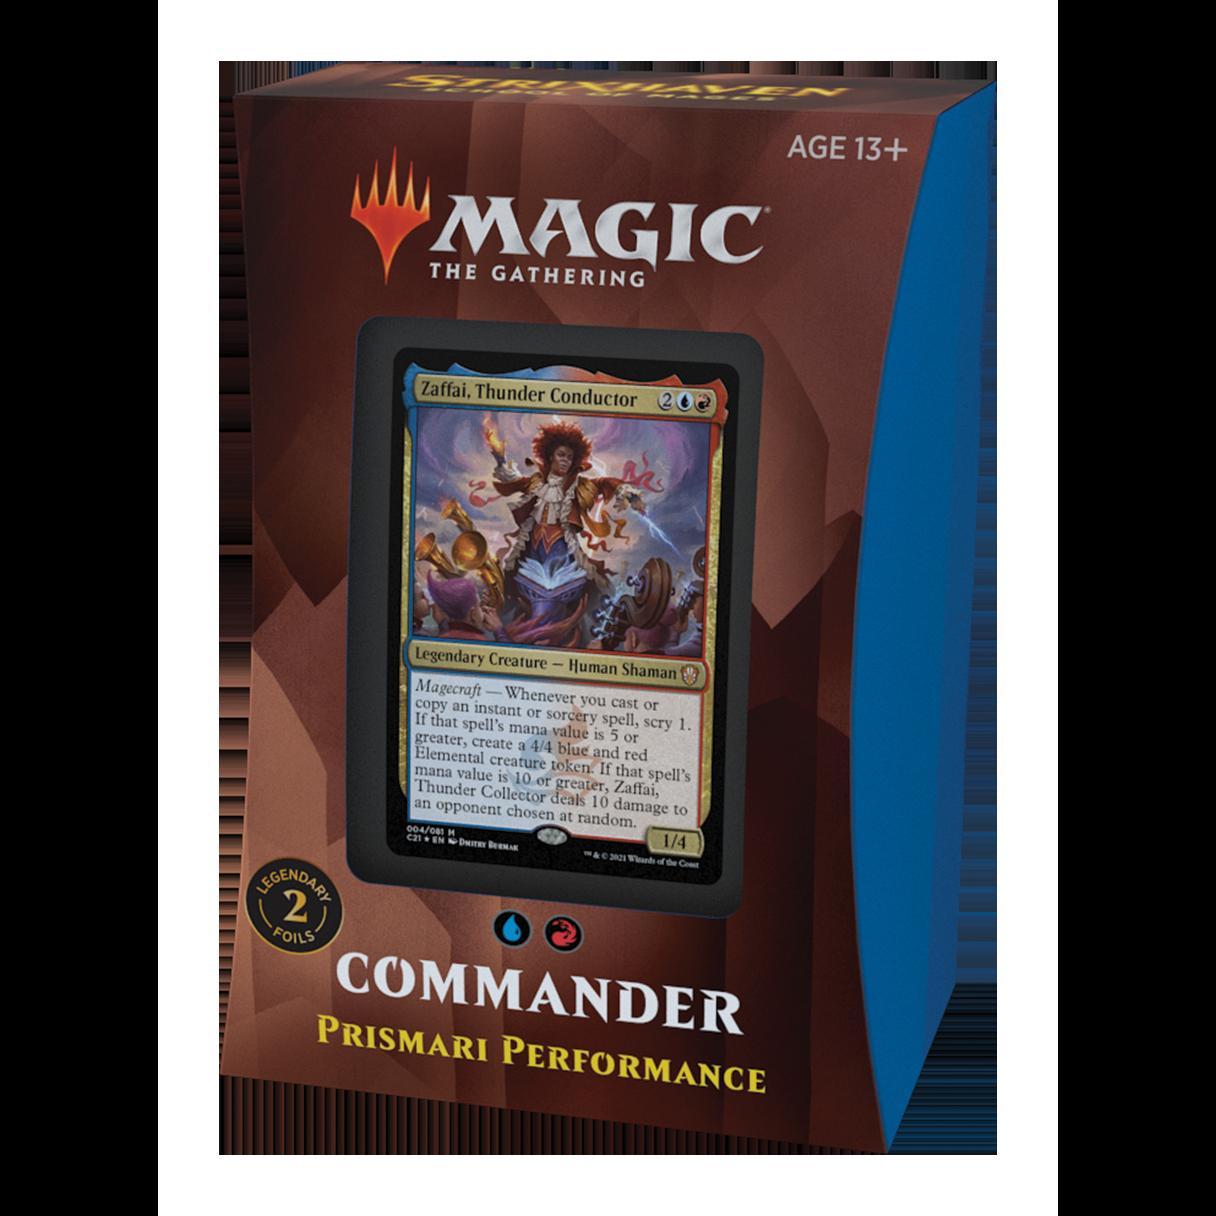 Strixhaven Commander Prismari Performance